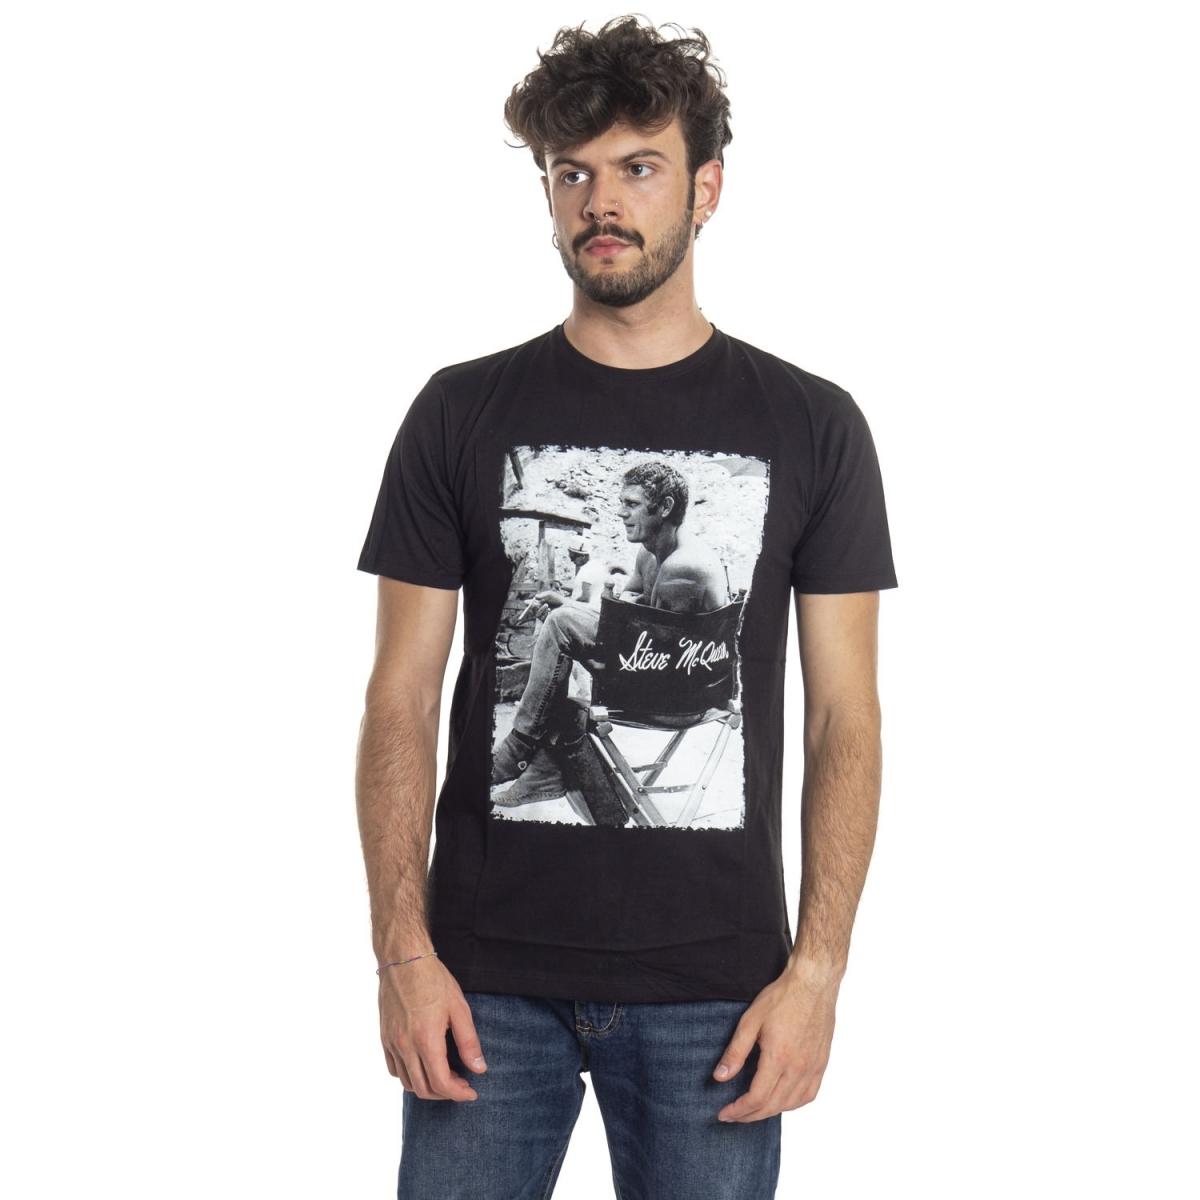 clothing T-shirt men T-Shirt LPX16-35 LANDEK PARK Cafedelmar Shop